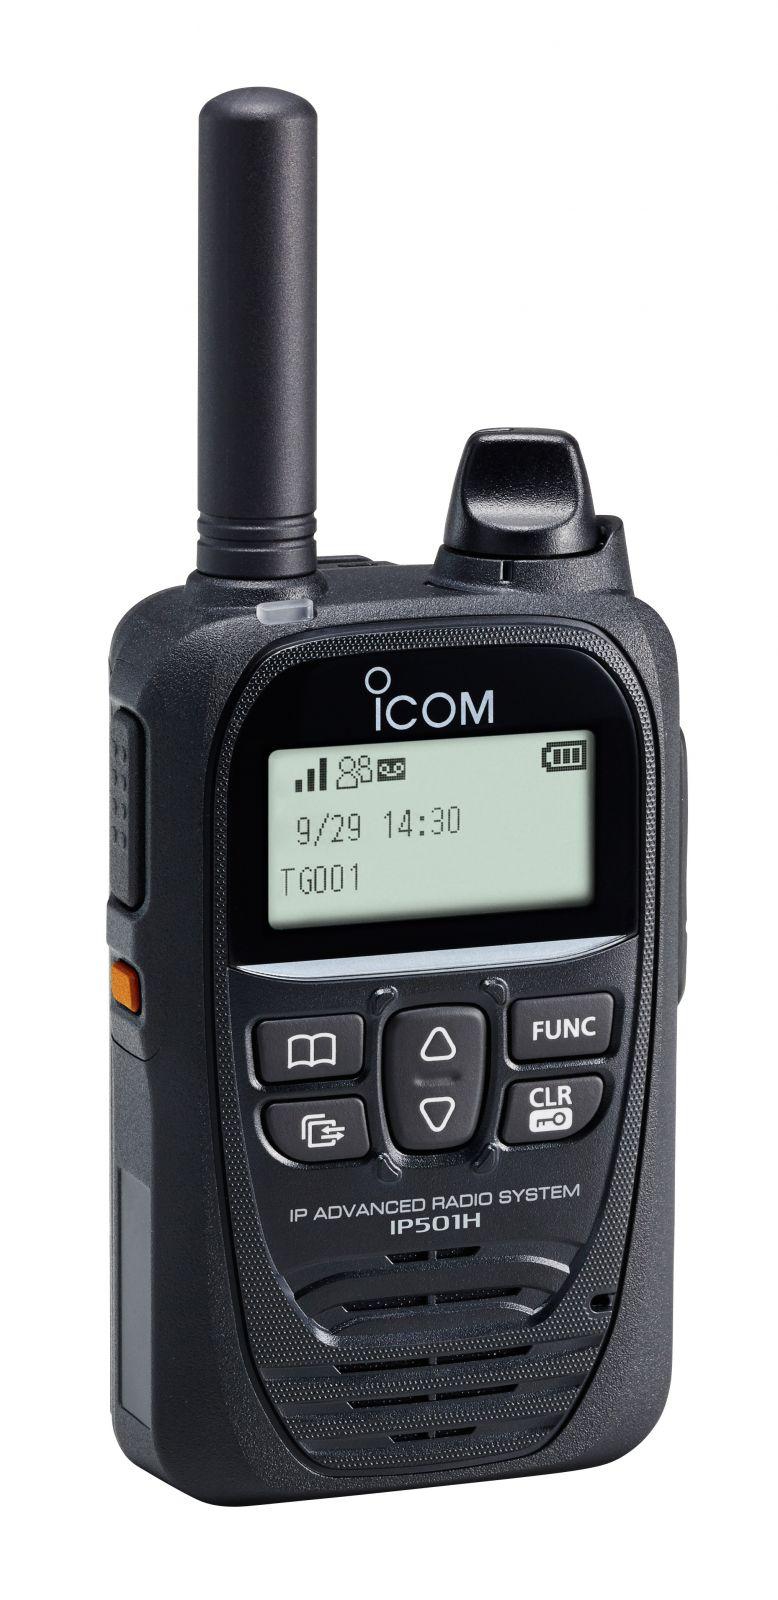 ICOM IP501H NETWORK RADIO